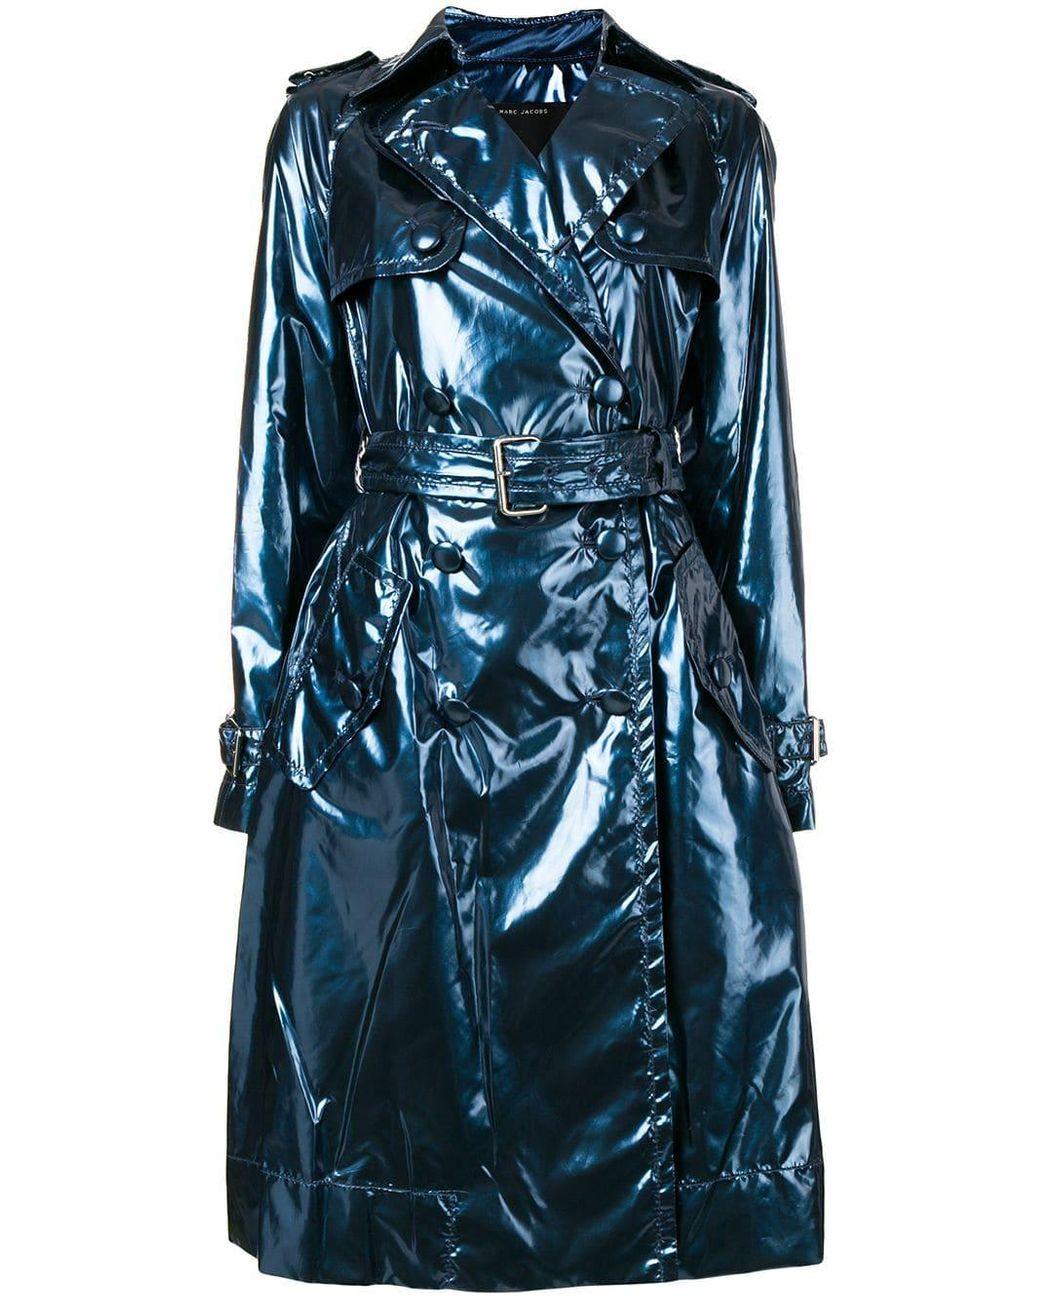 70f36f4a1 Women's Blue Vinyl Trench Coat